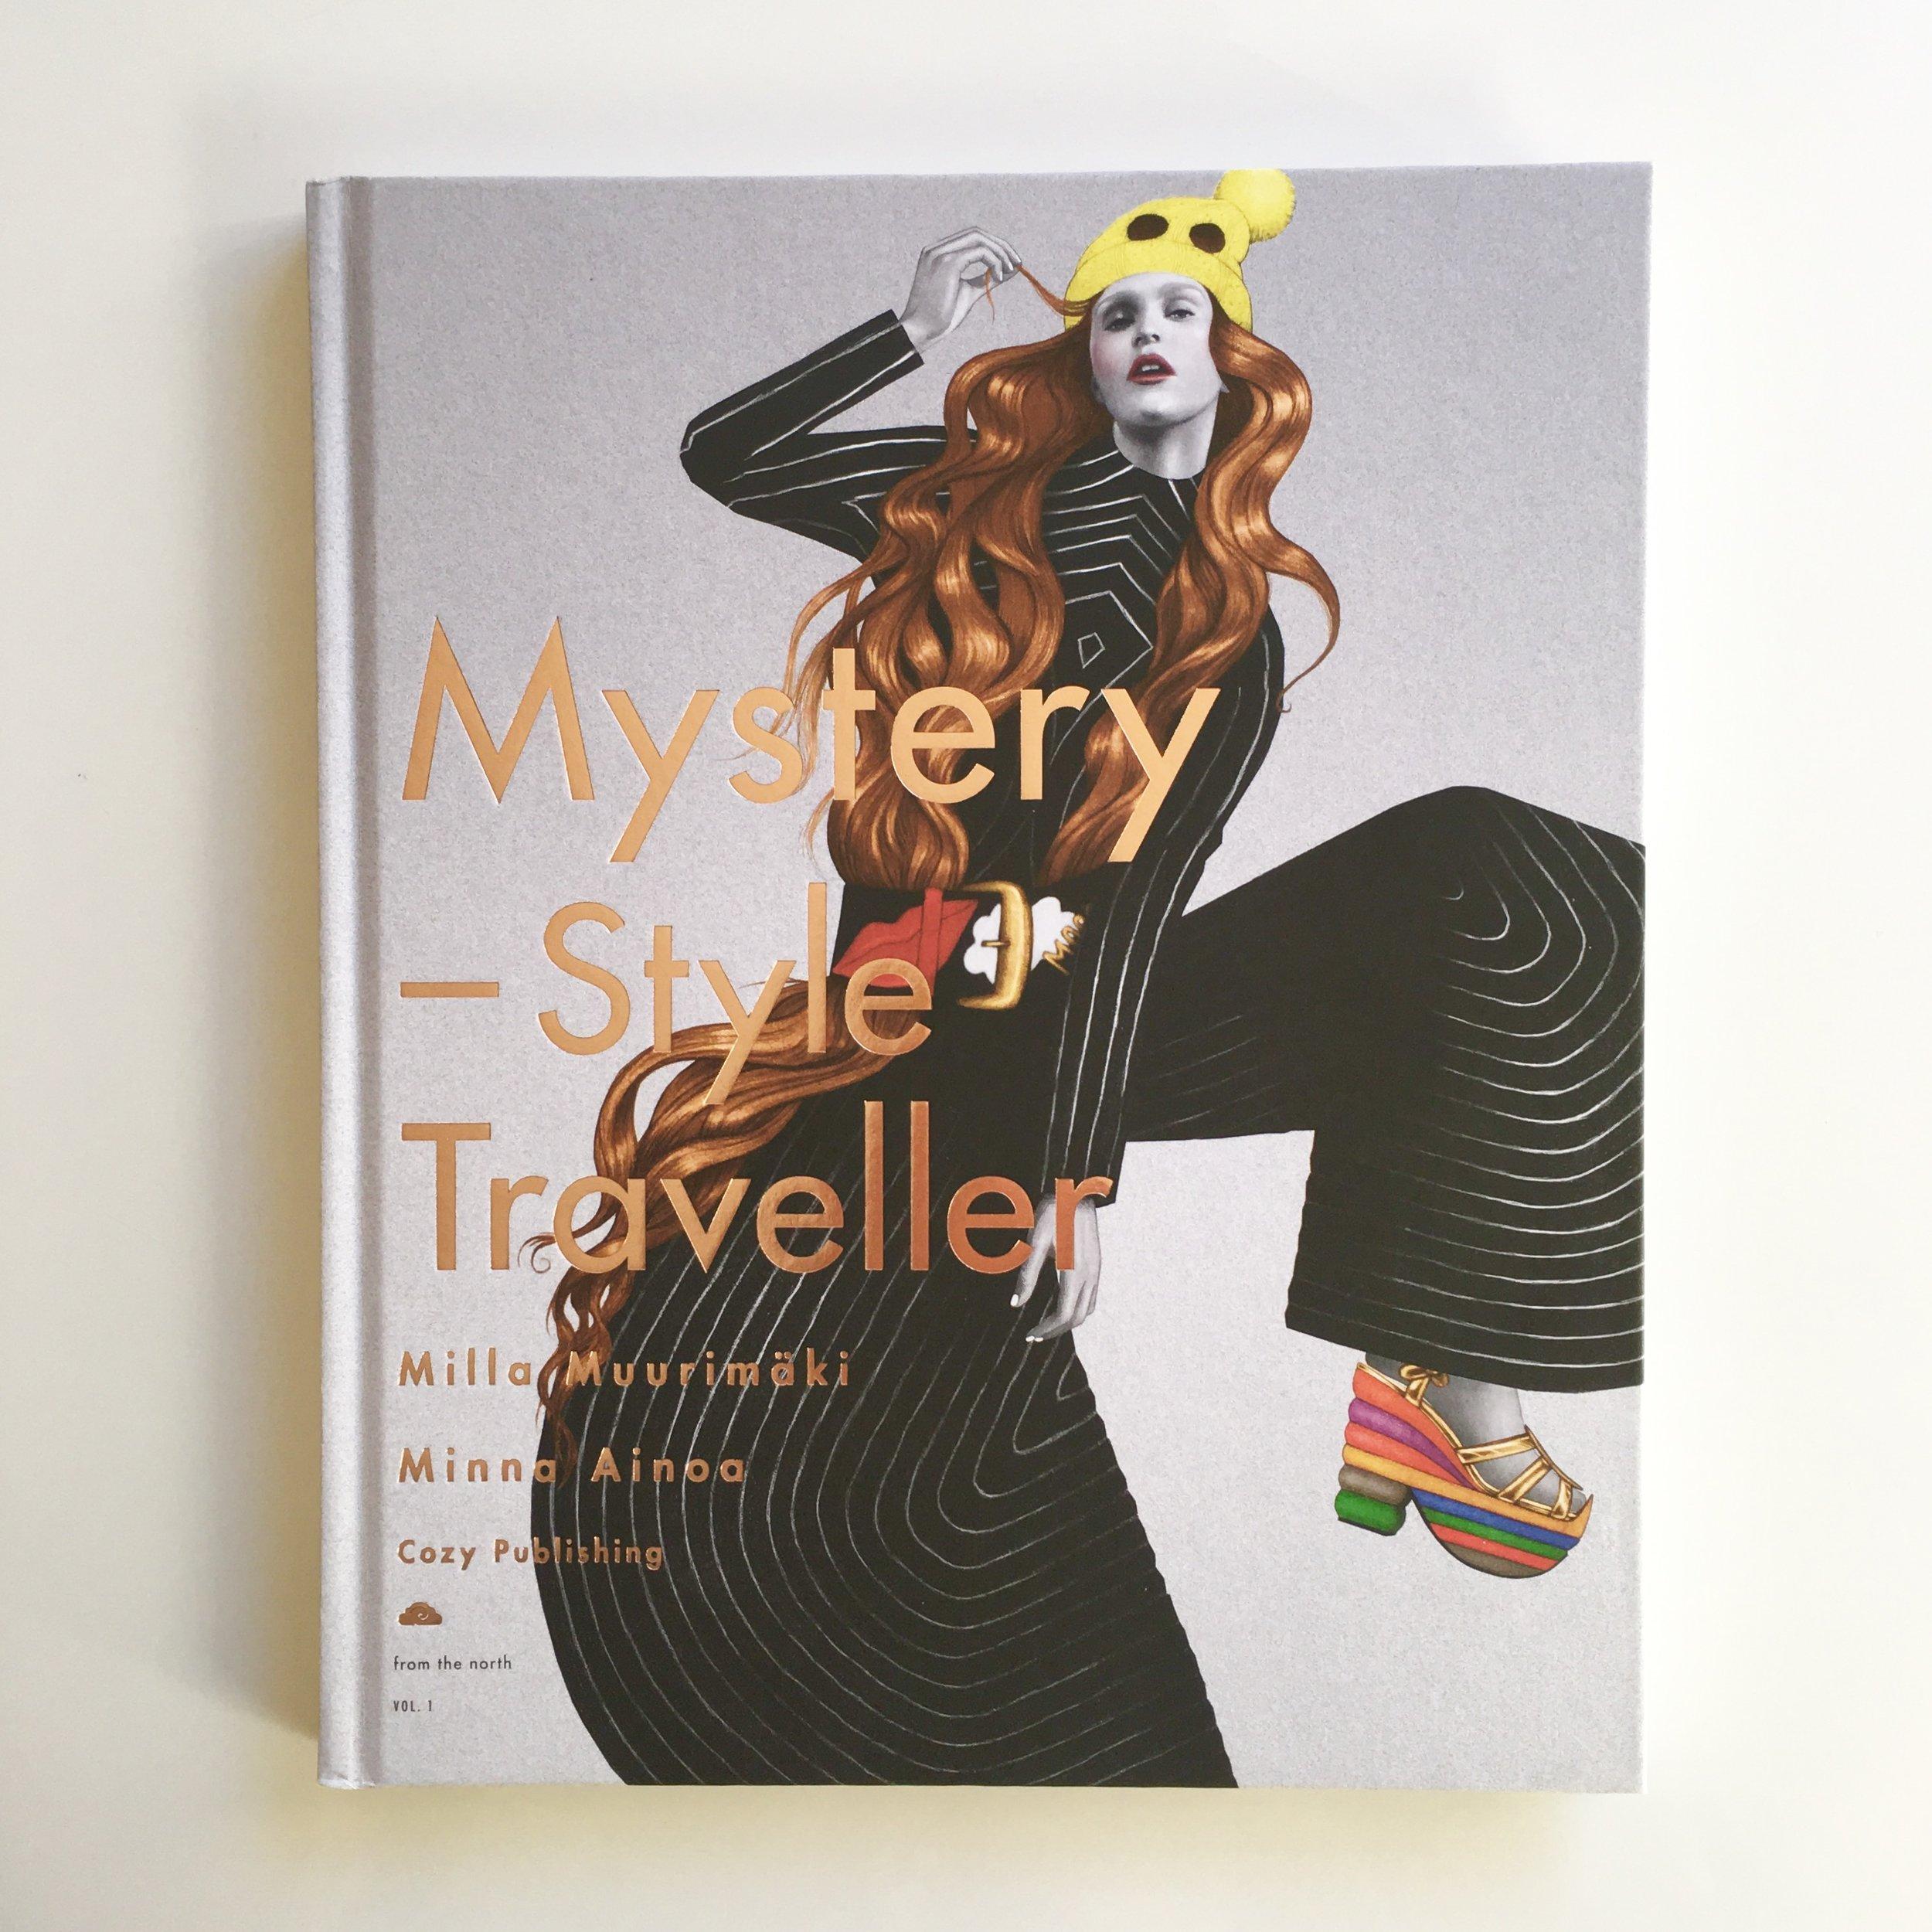 Mystery - Style traveller